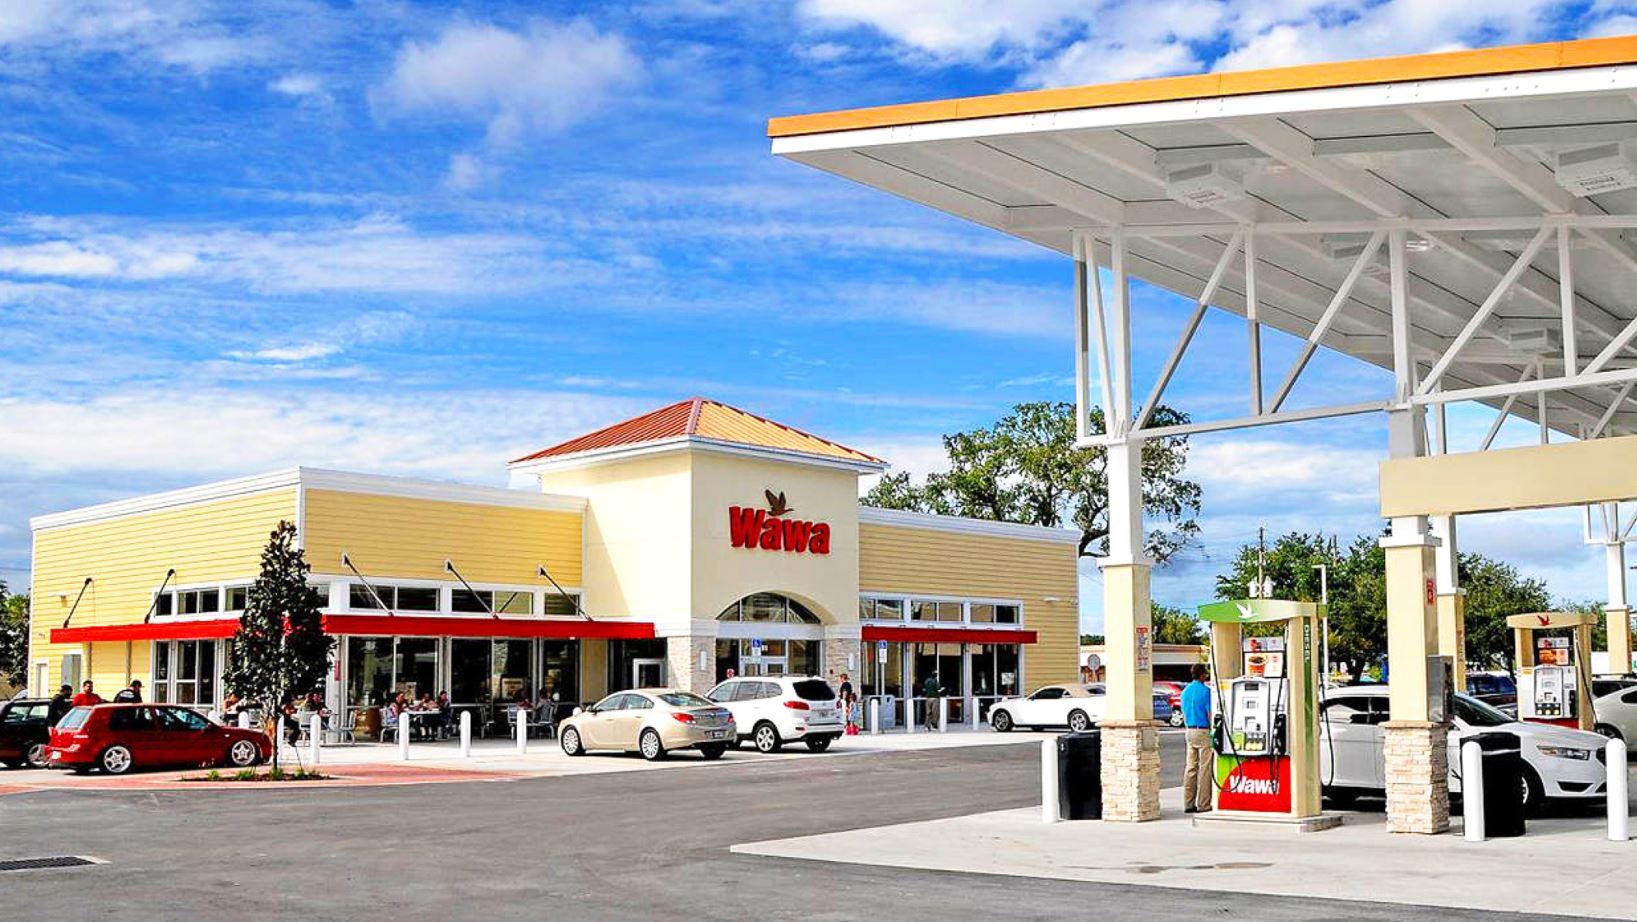 Wawa convenience store as a Triple Net property - Liberty Real Estate